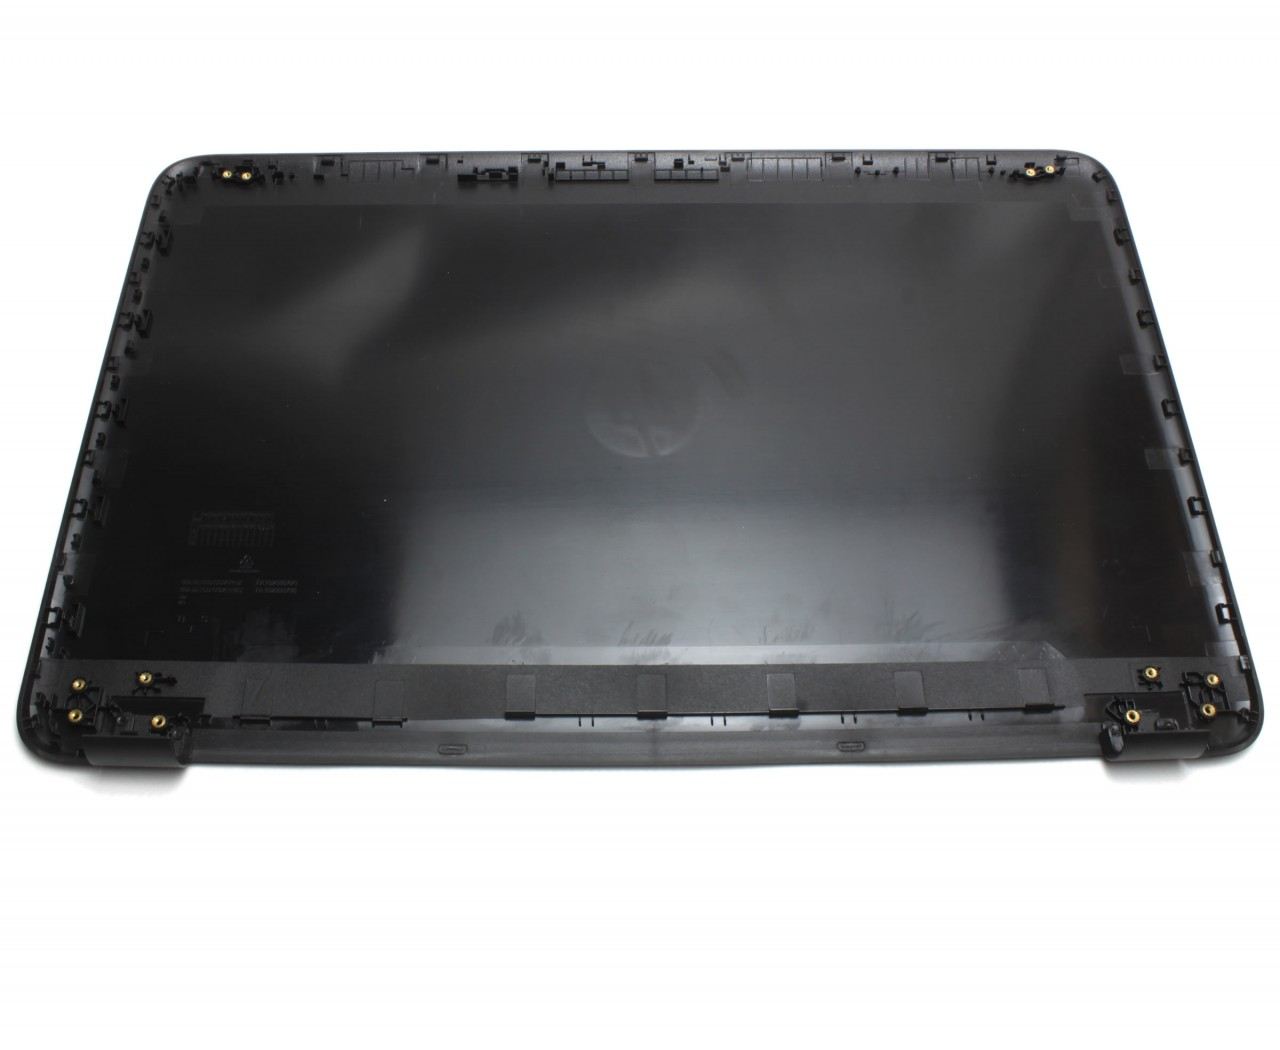 Capac Display BackCover HP FA102000720 Carcasa Display Argintie imagine powerlaptop.ro 2021